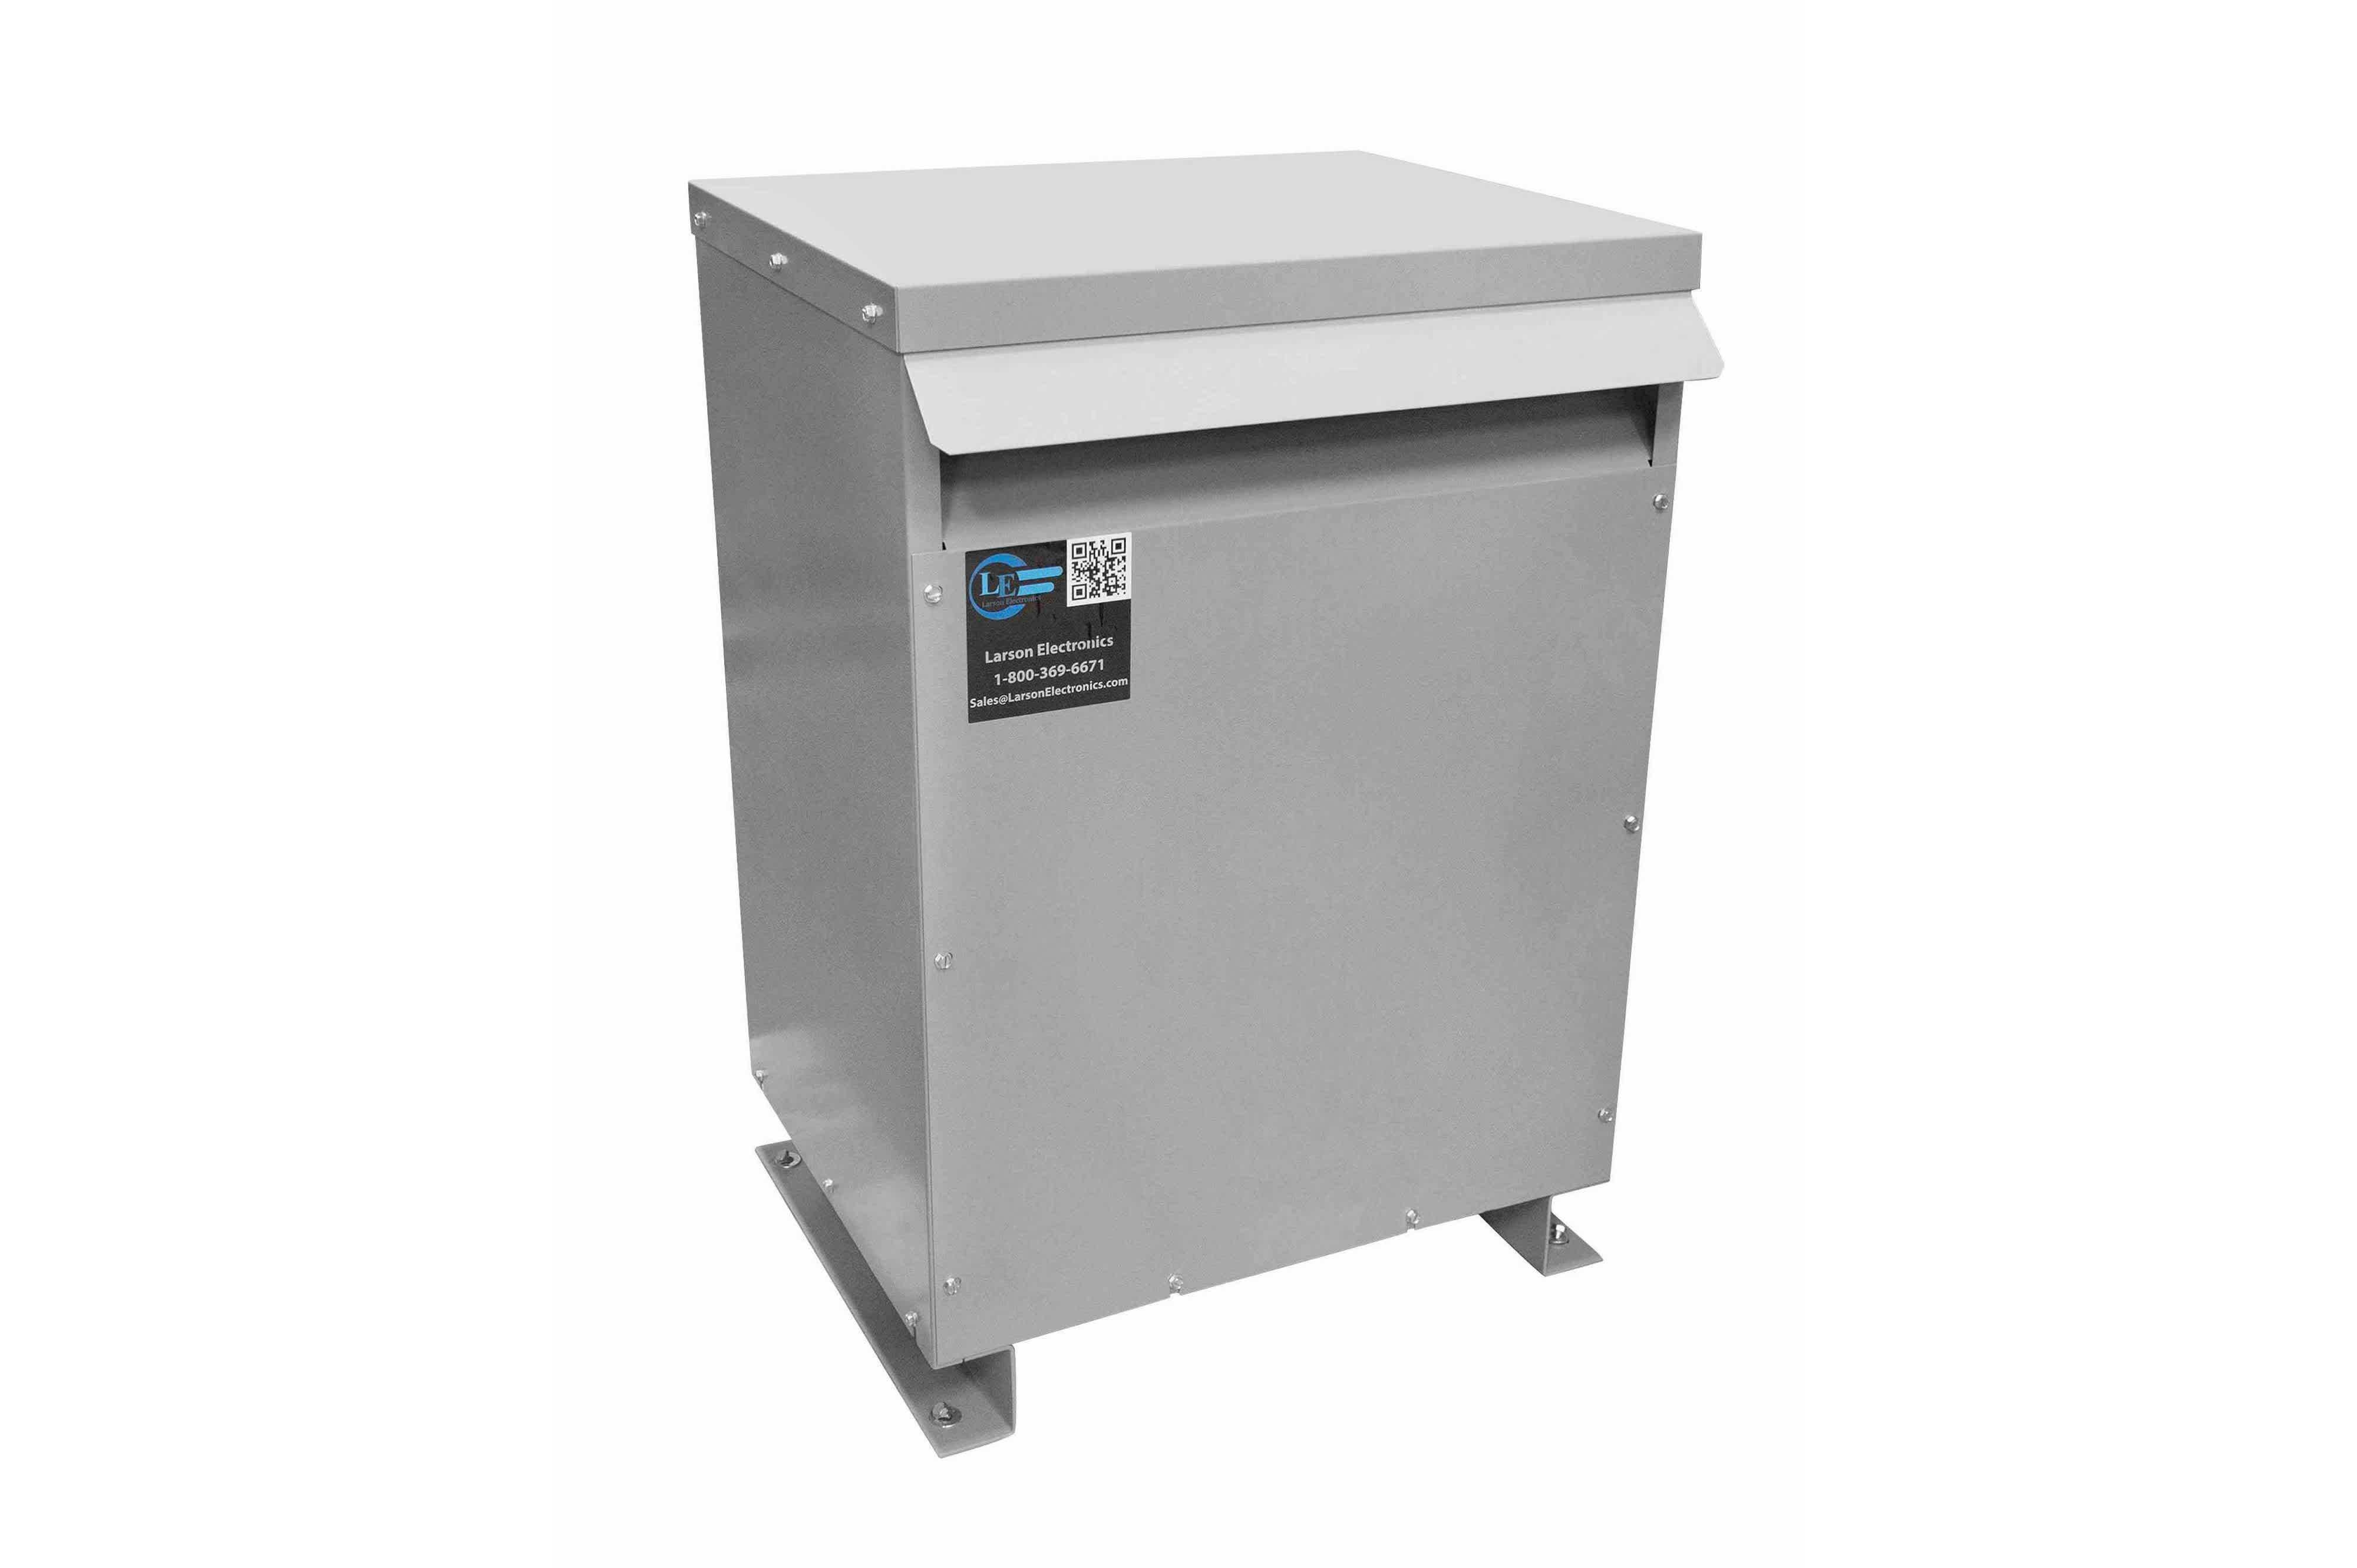 36 kVA 3PH Isolation Transformer, 400V Wye Primary, 600Y/347 Wye-N Secondary, N3R, Ventilated, 60 Hz